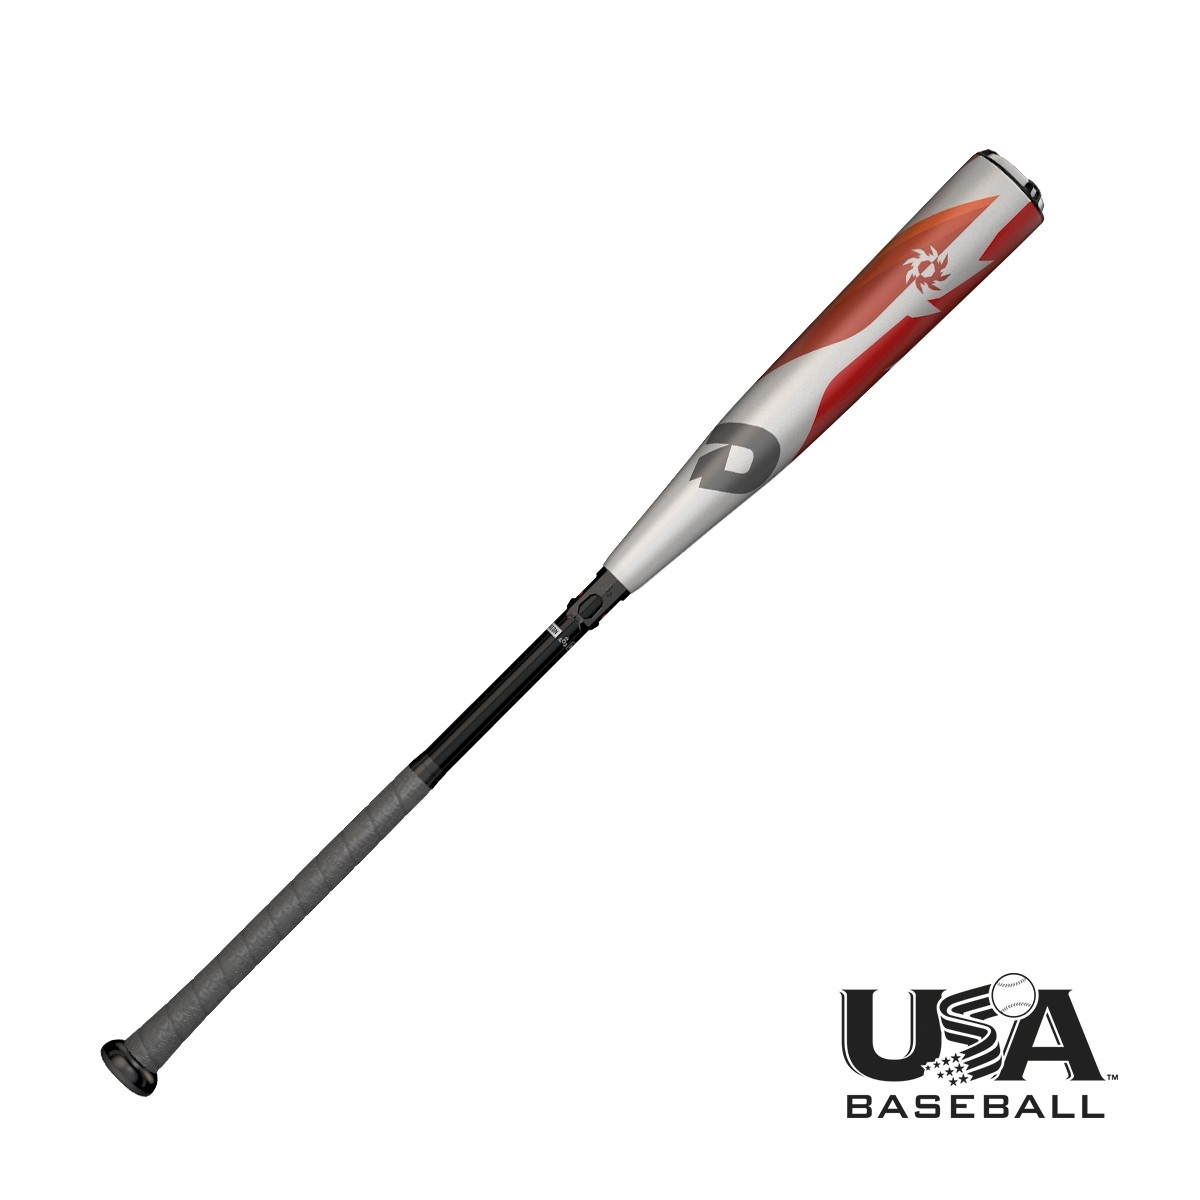 demarini-voodoo-10-2018-usa-balanced-2-5-8-baseball-bat-28-inch-18-oz WTDXUD21828-18  887768610623 Following along with the new USA baseball standards the newest line